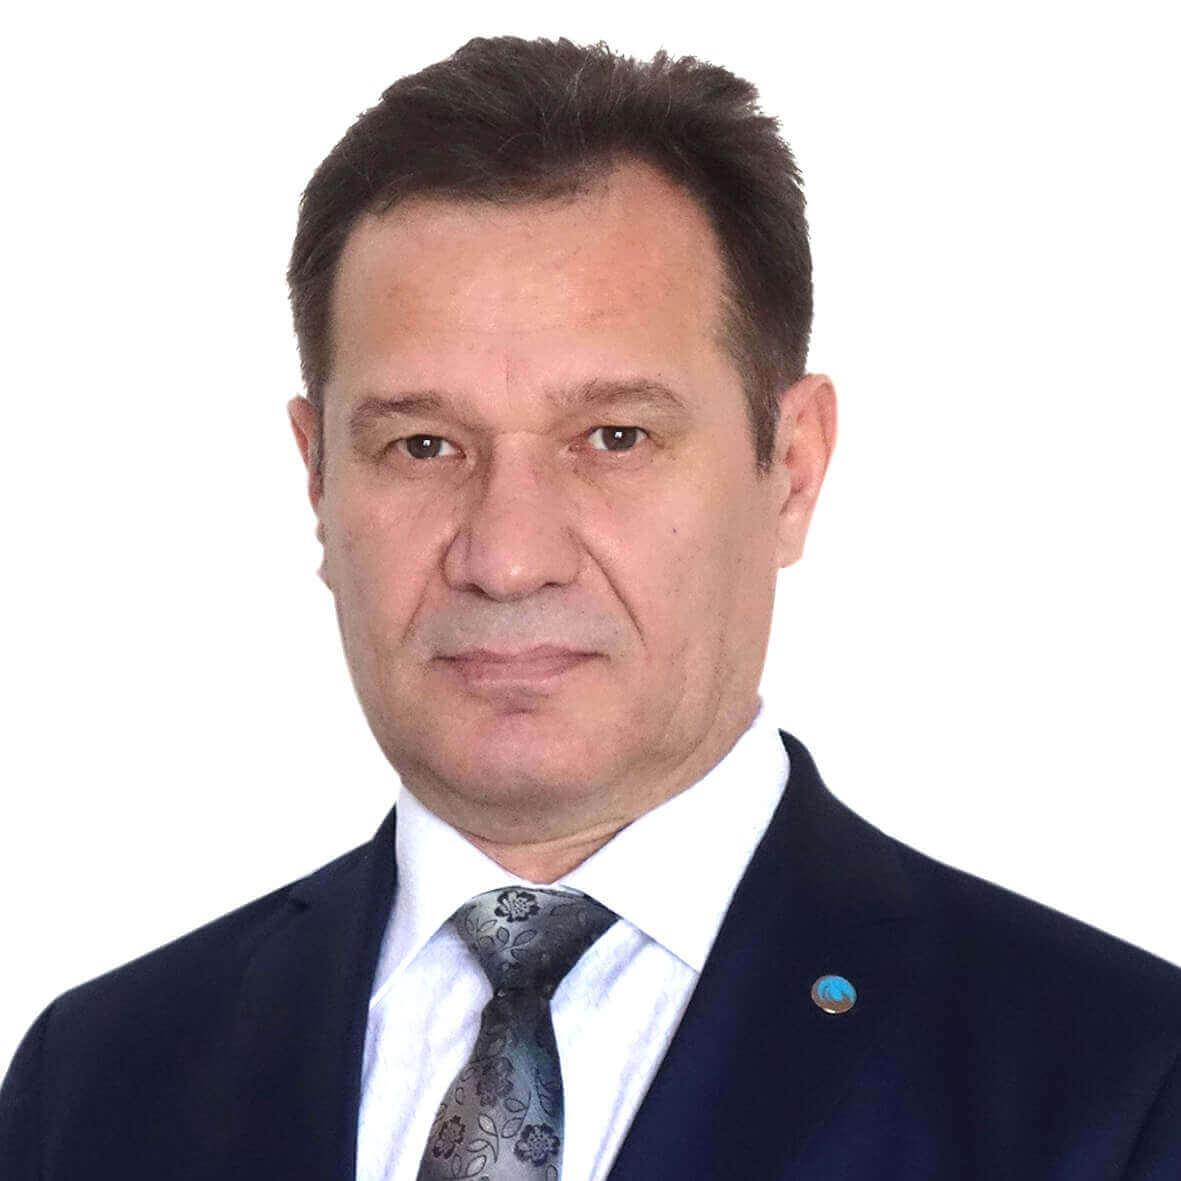 Соснин Сергей